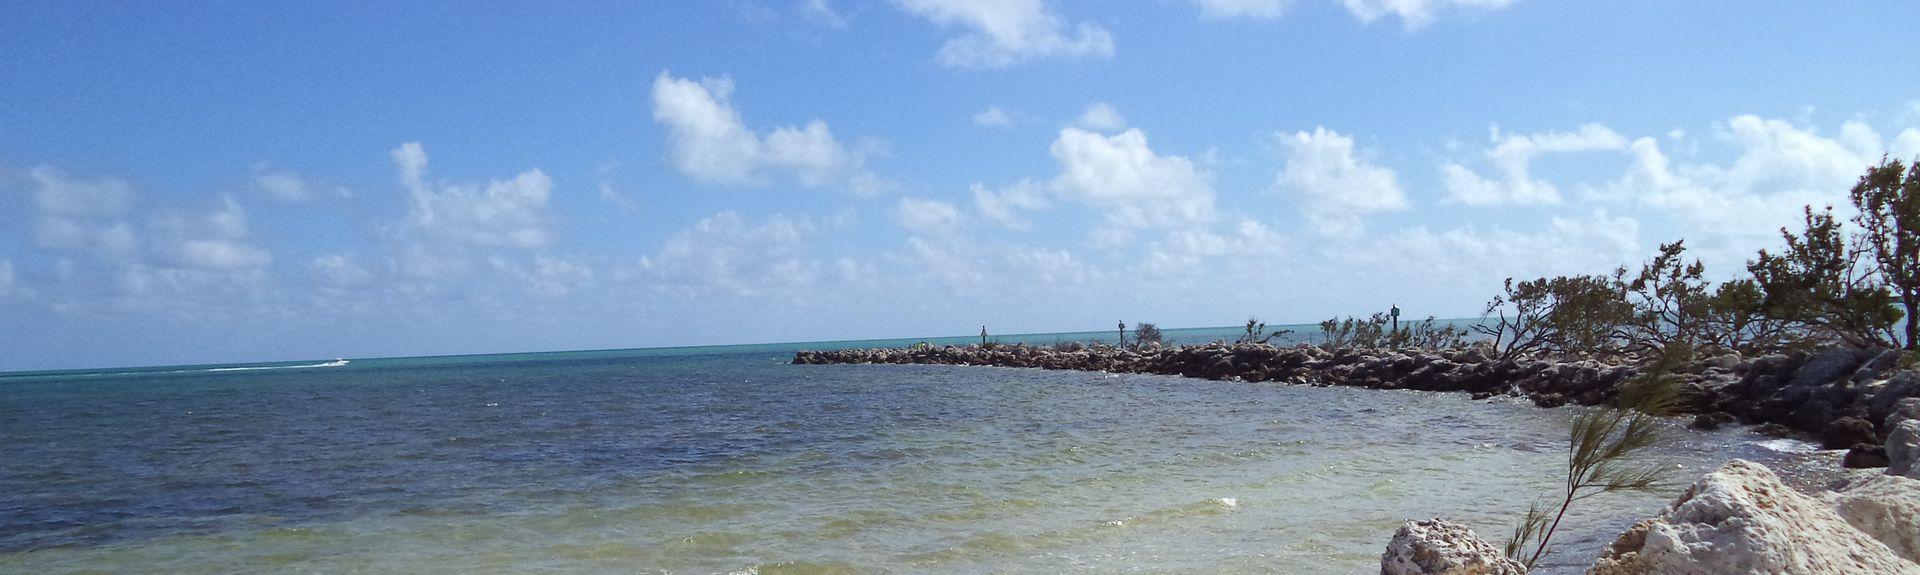 Dolphins Plus Bayside, Key Largo, FL, USA